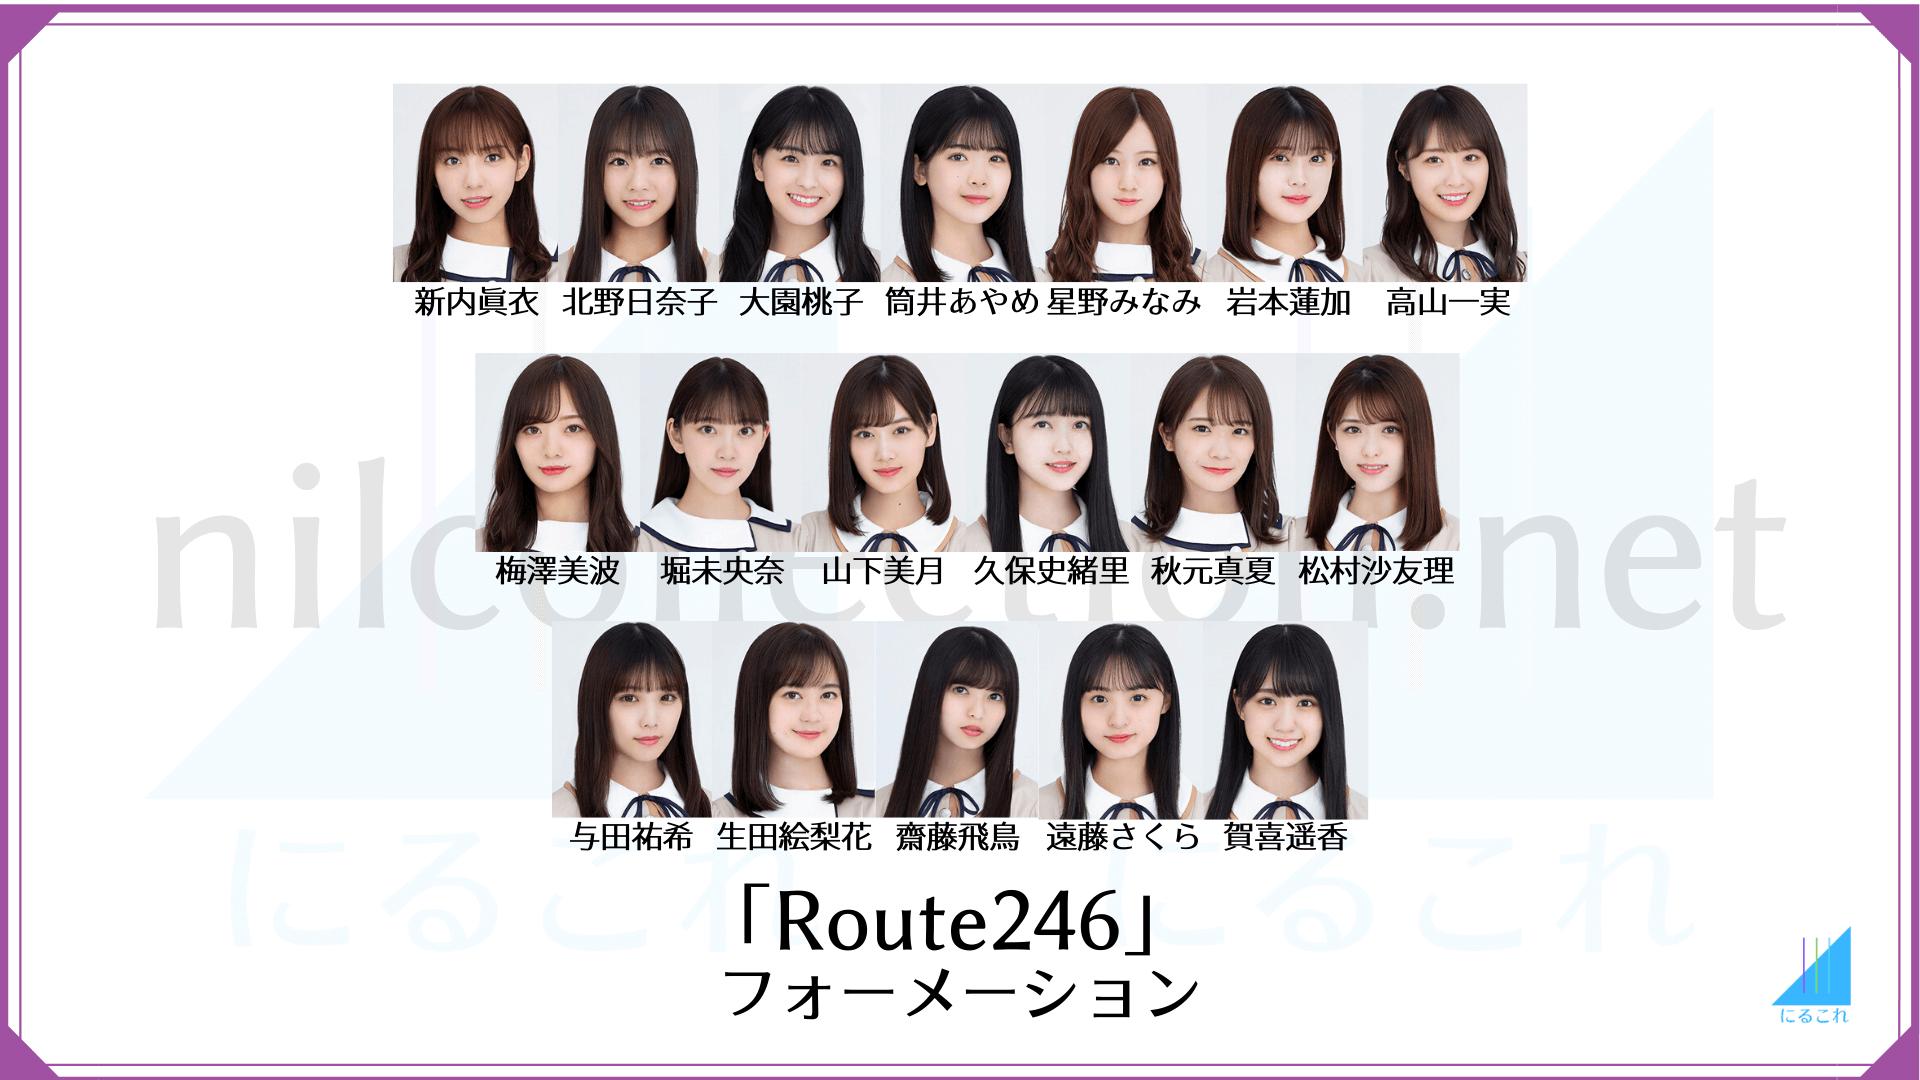 Route246のフォーメーション 乃木坂46